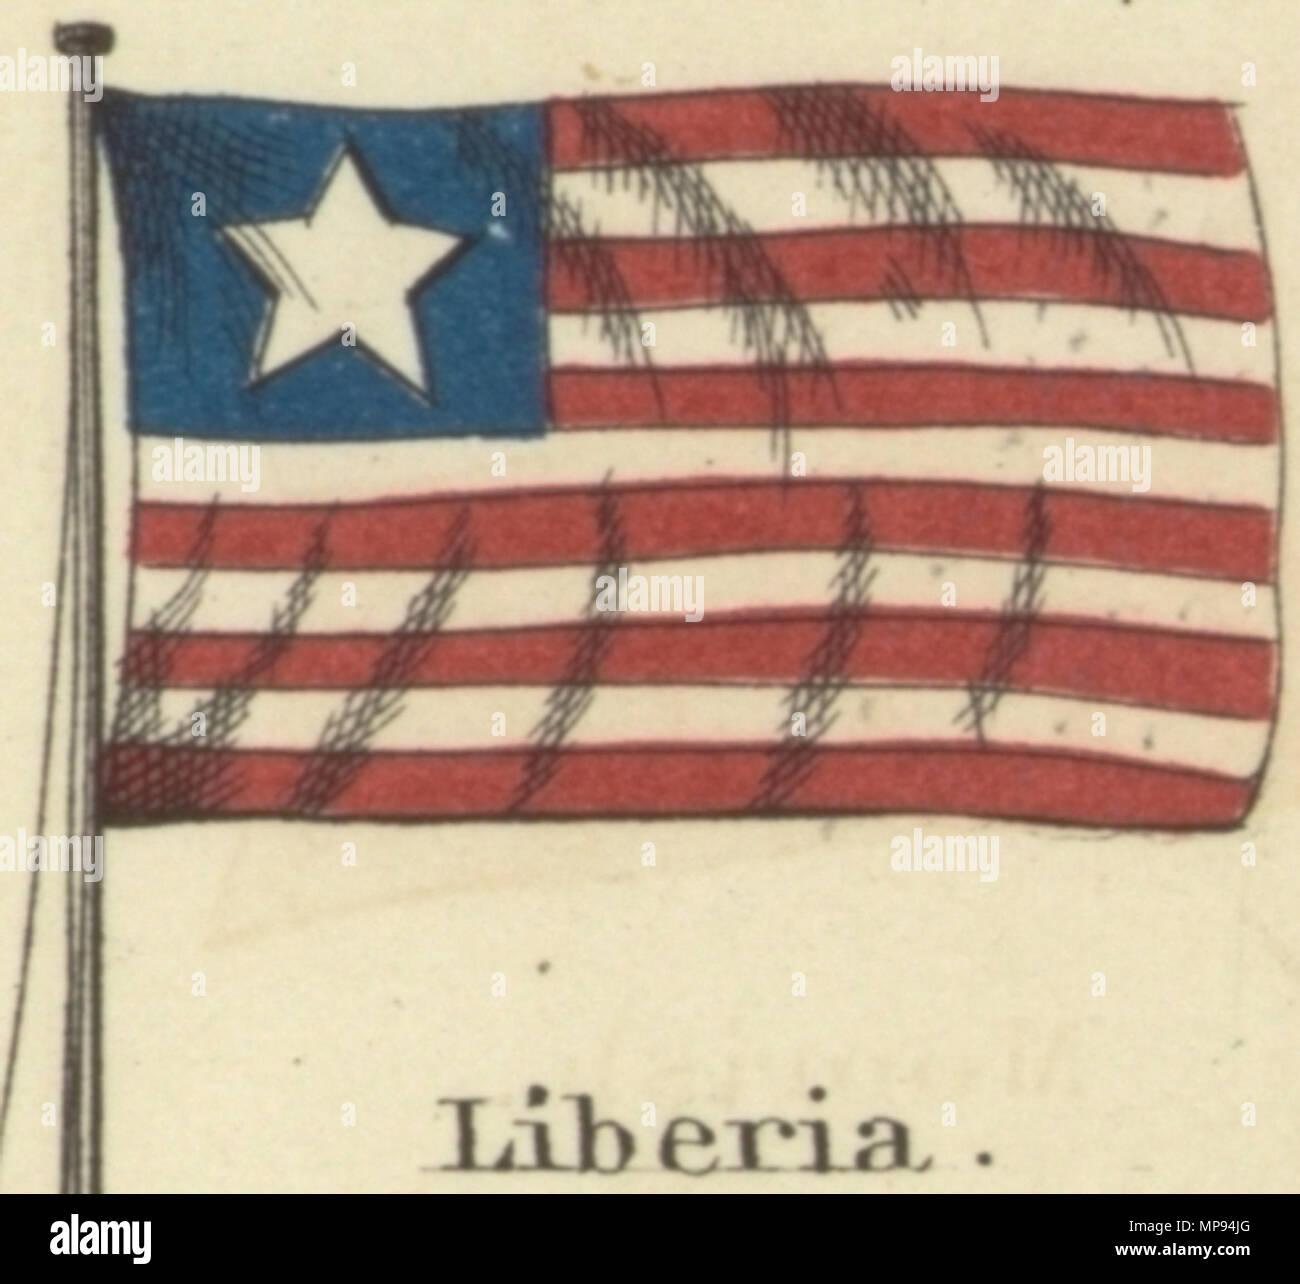 English Liberia Johnsons New Chart Of National Emblems 1868g